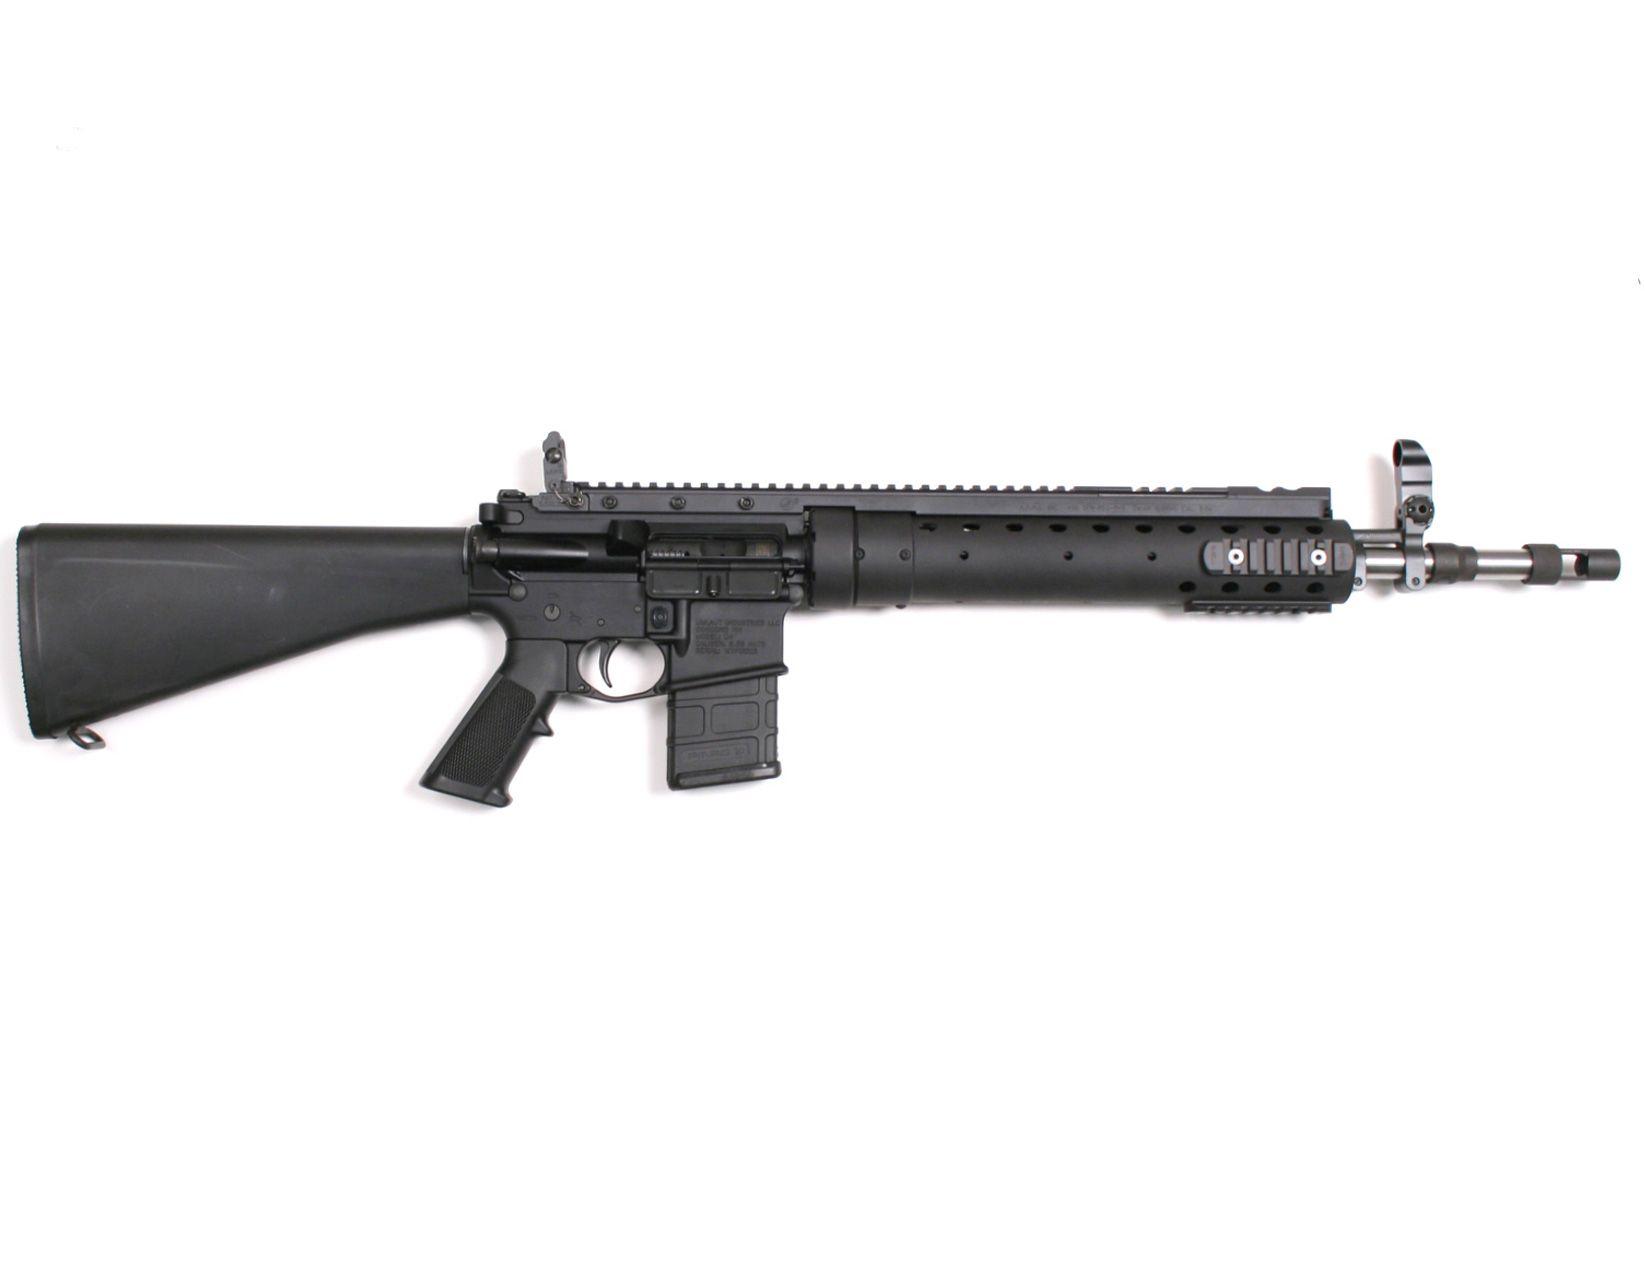 Umlaut Industries Mk12 Mod0 Rifle | Weapons | Guns ...